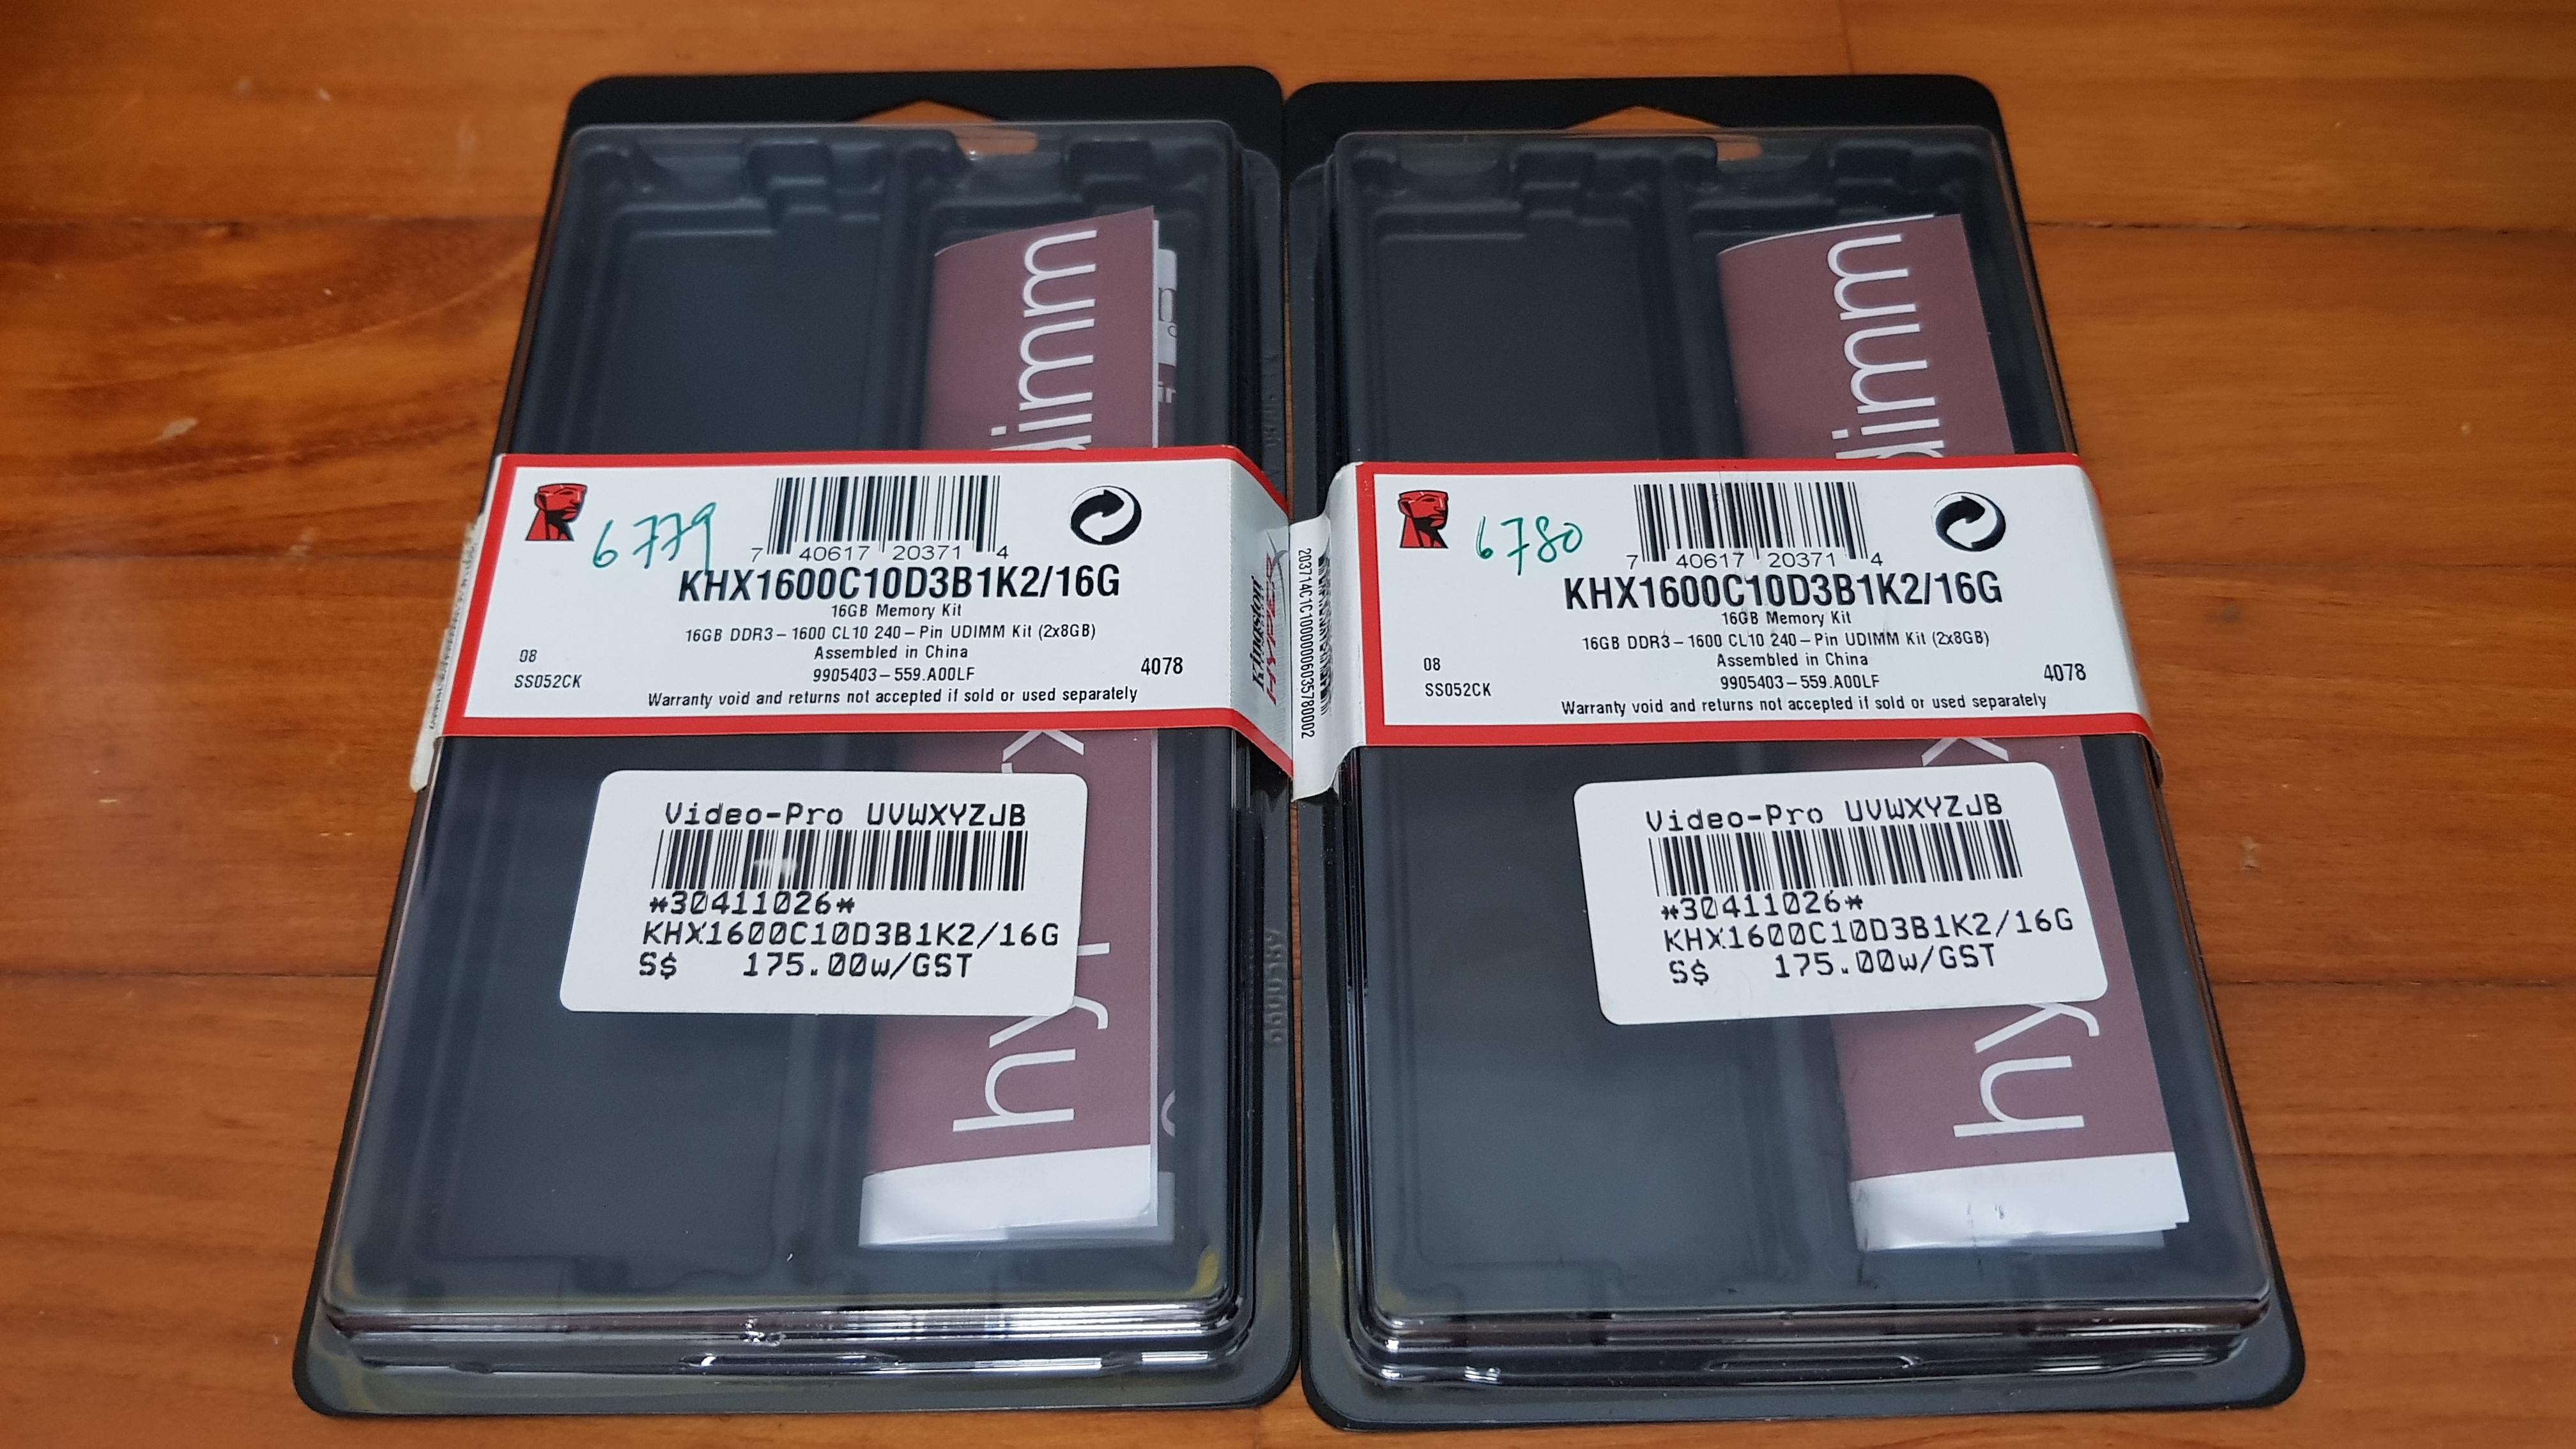 AMD FX8350 with CM HYPER TX3 EVO / ASUS M5A97 R2 / KINGSTON